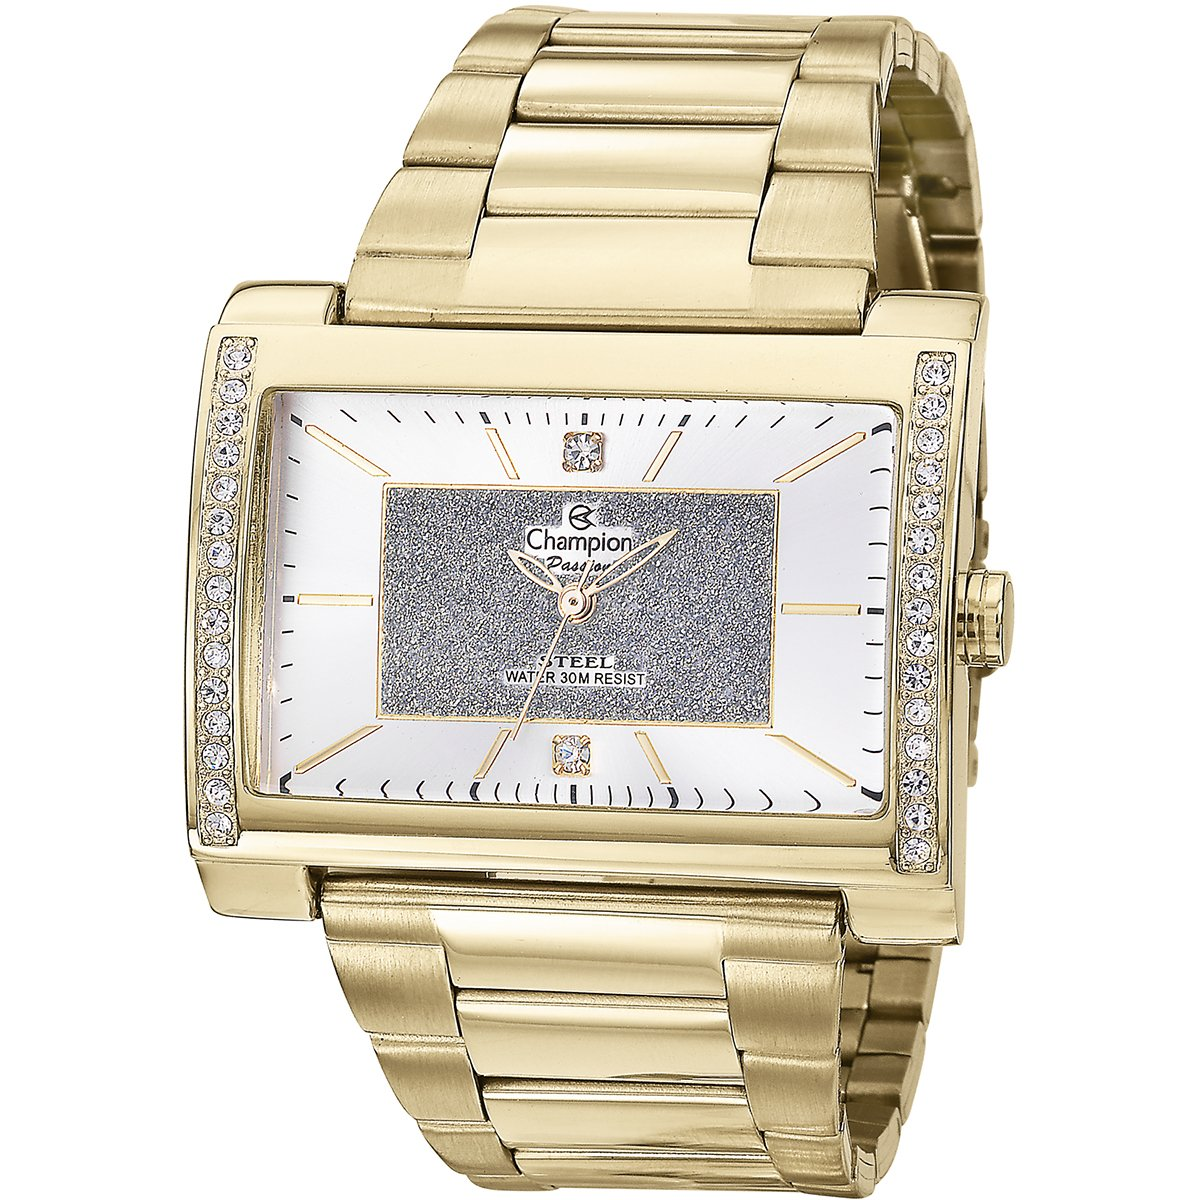 18a92ab6060 Relógio Champion Passion-CH2468 - Compre Agora